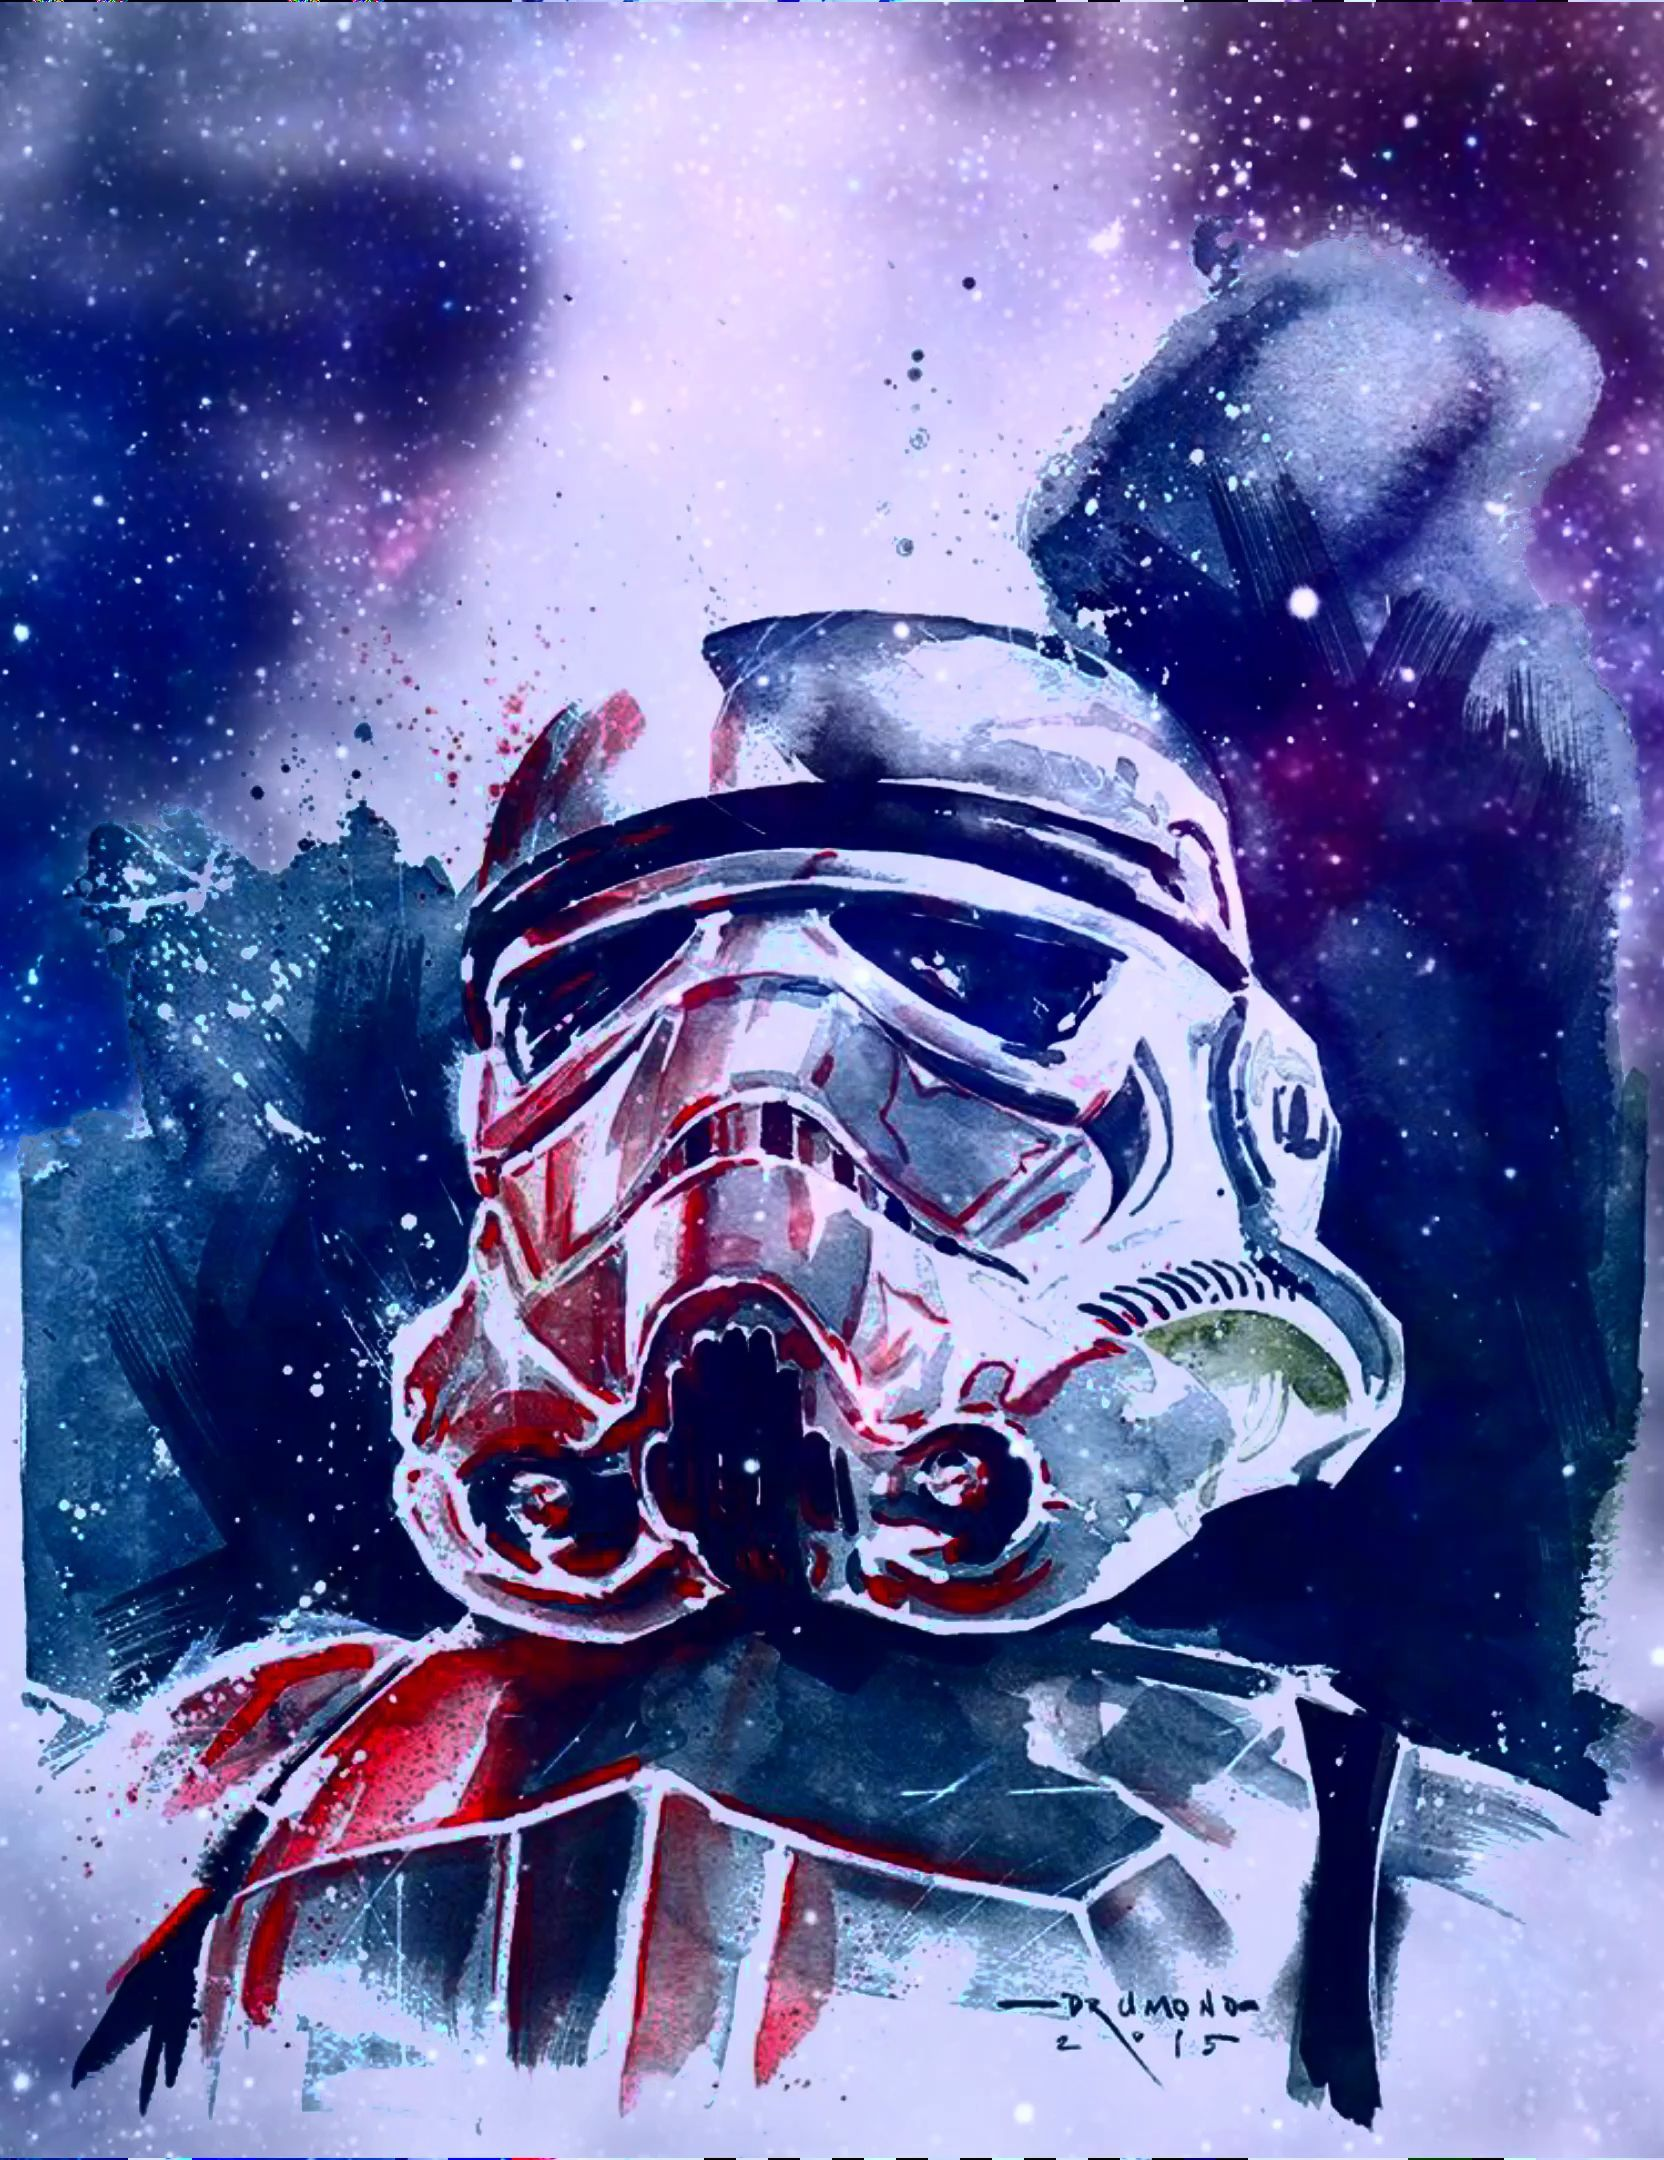 Live Wallpaper Star Wars Stormtroopers Ideas Of Star Wars Stormtroopers Starwars Stormtroopers Star In 2020 Star Wars Wallpaper Star Wars Painting Star Wars Art